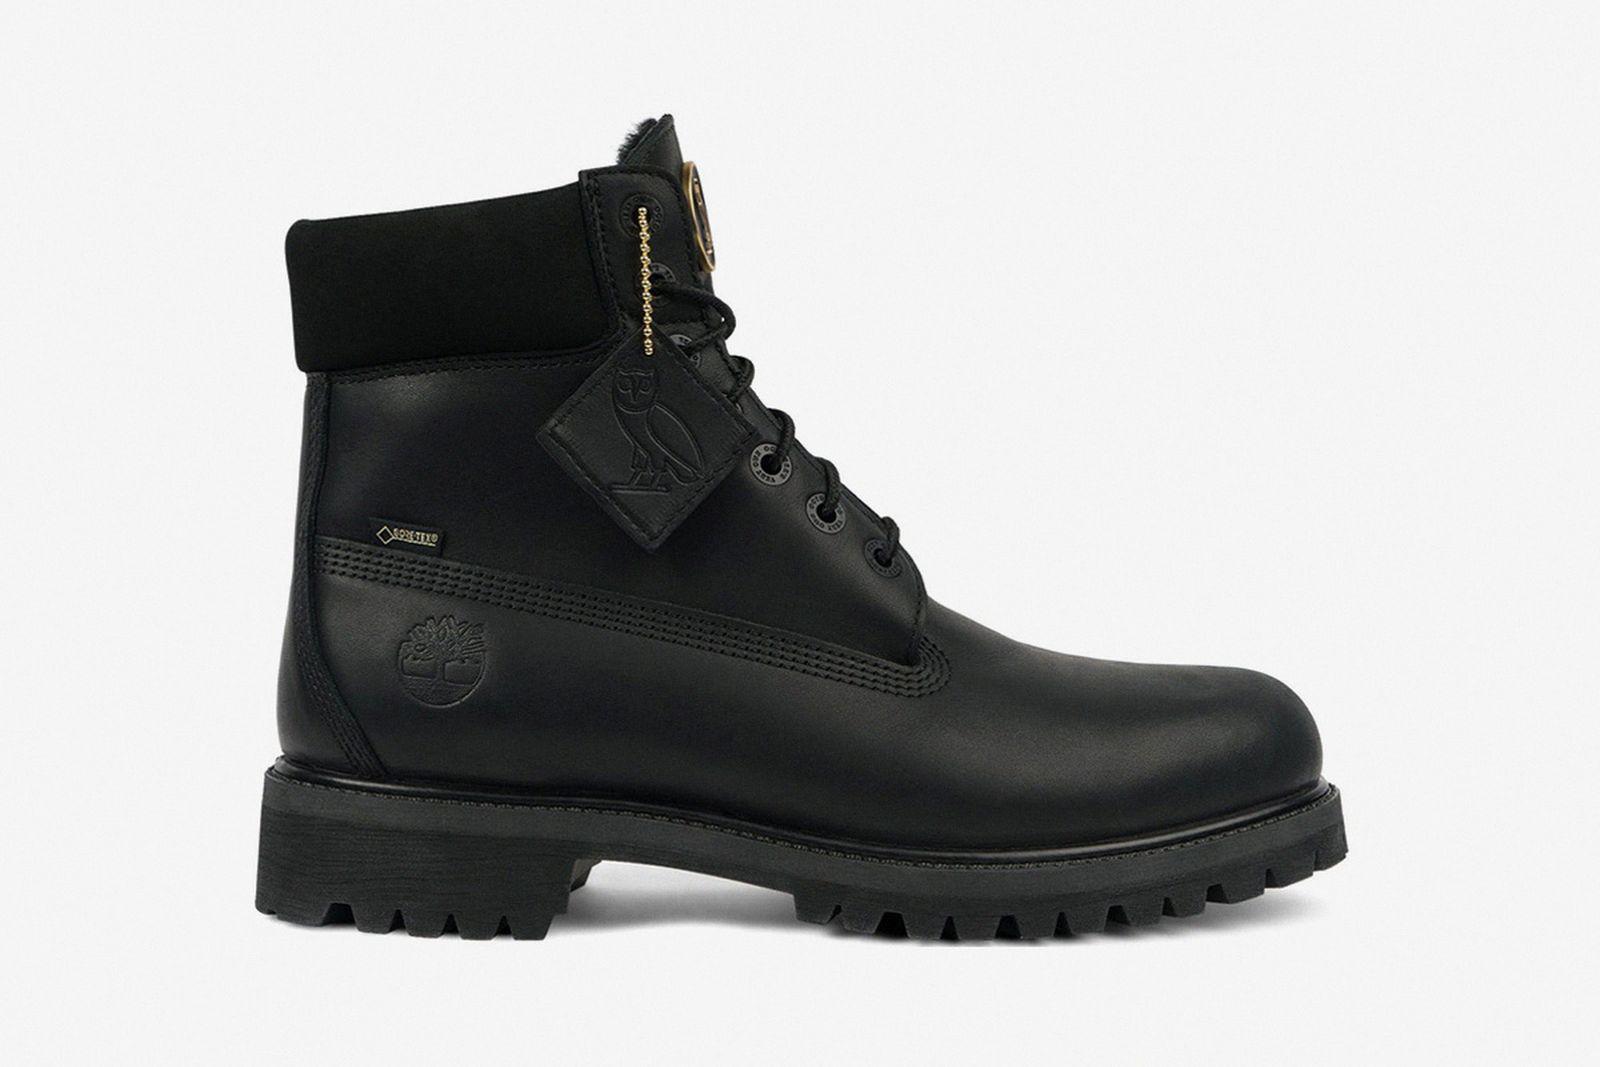 drake-ovo-footwear-collaboration-history-114